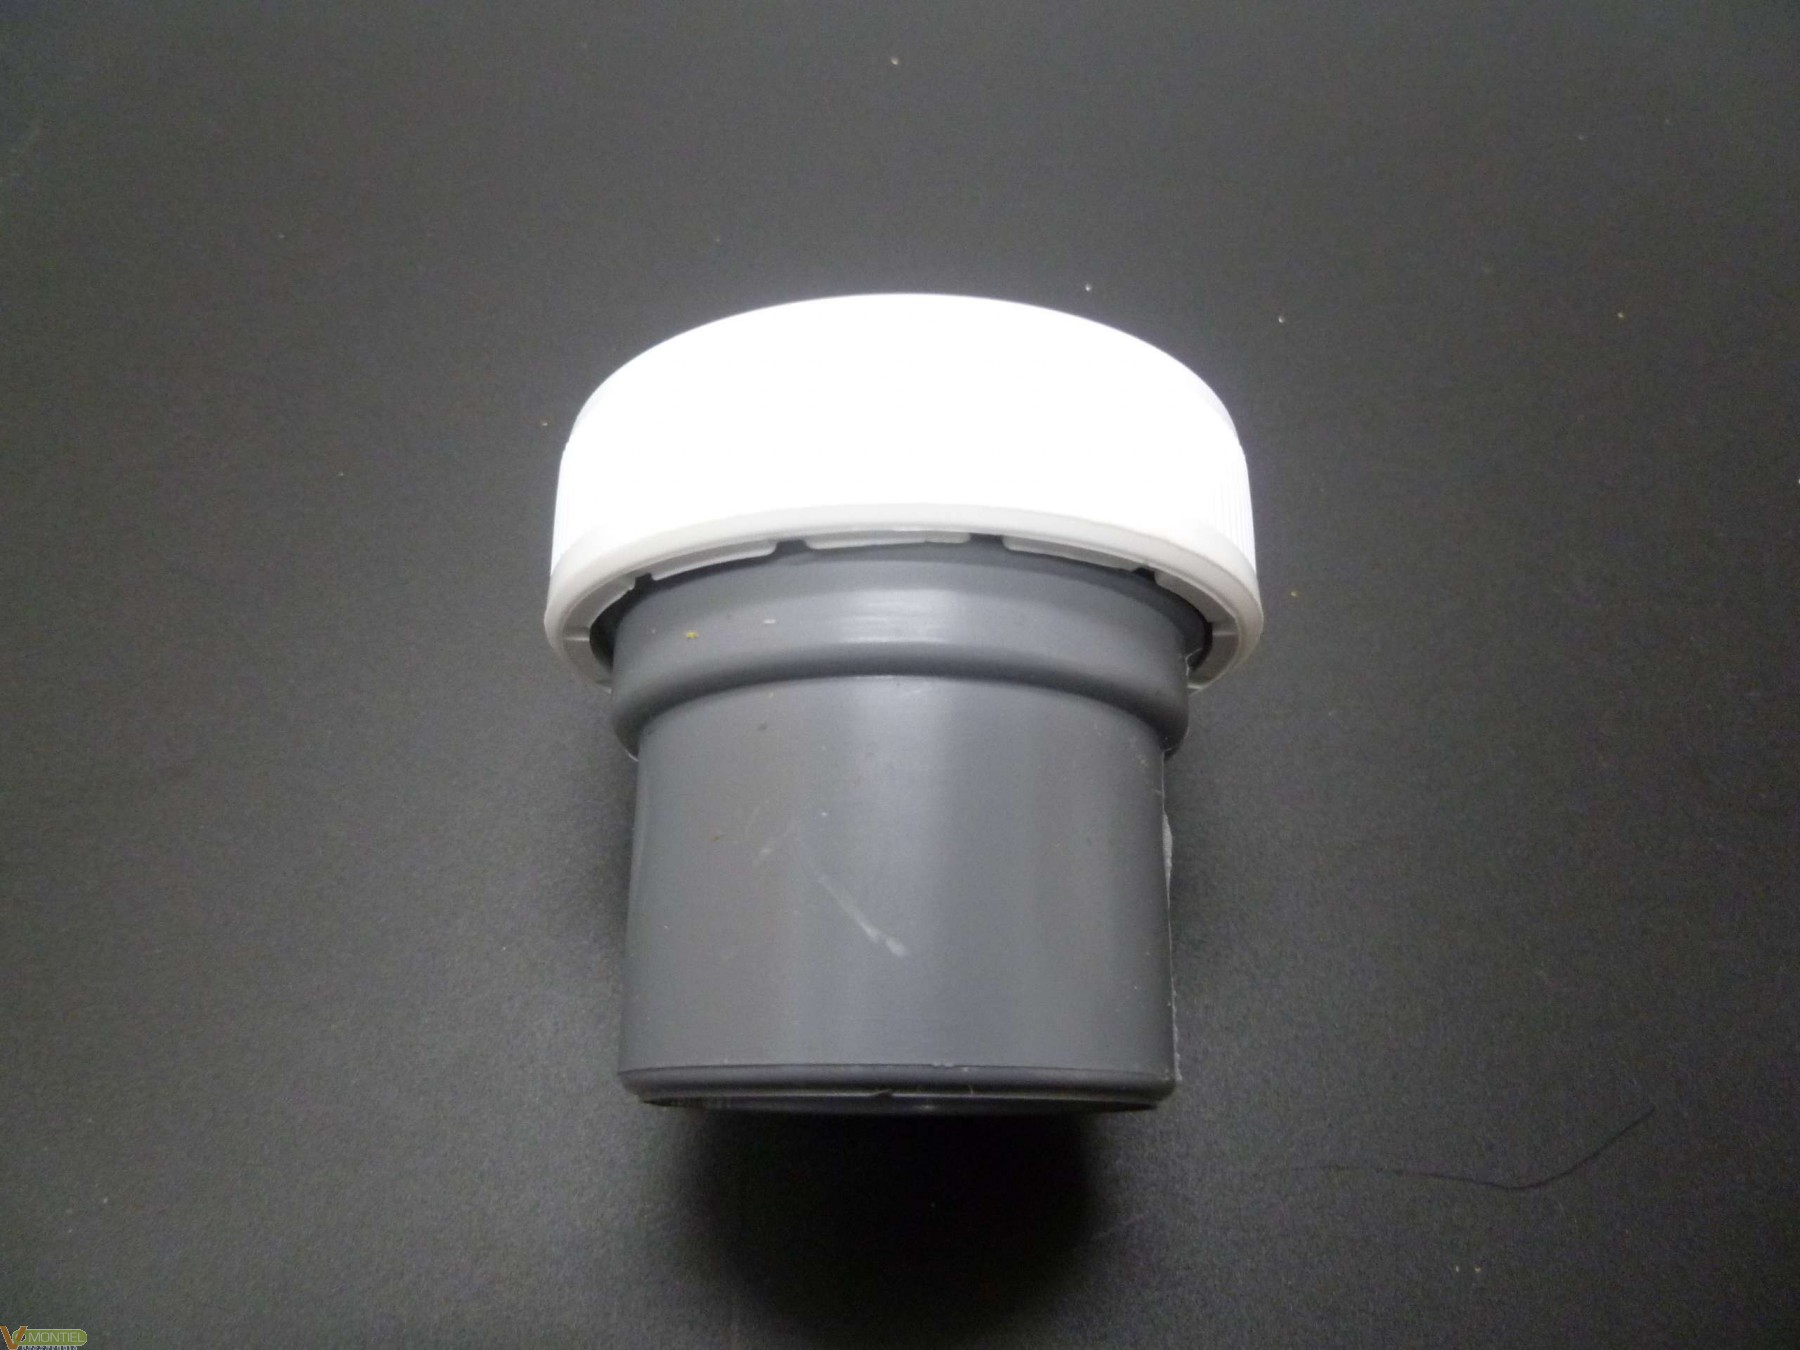 Enlace mixto 40mm-11/2